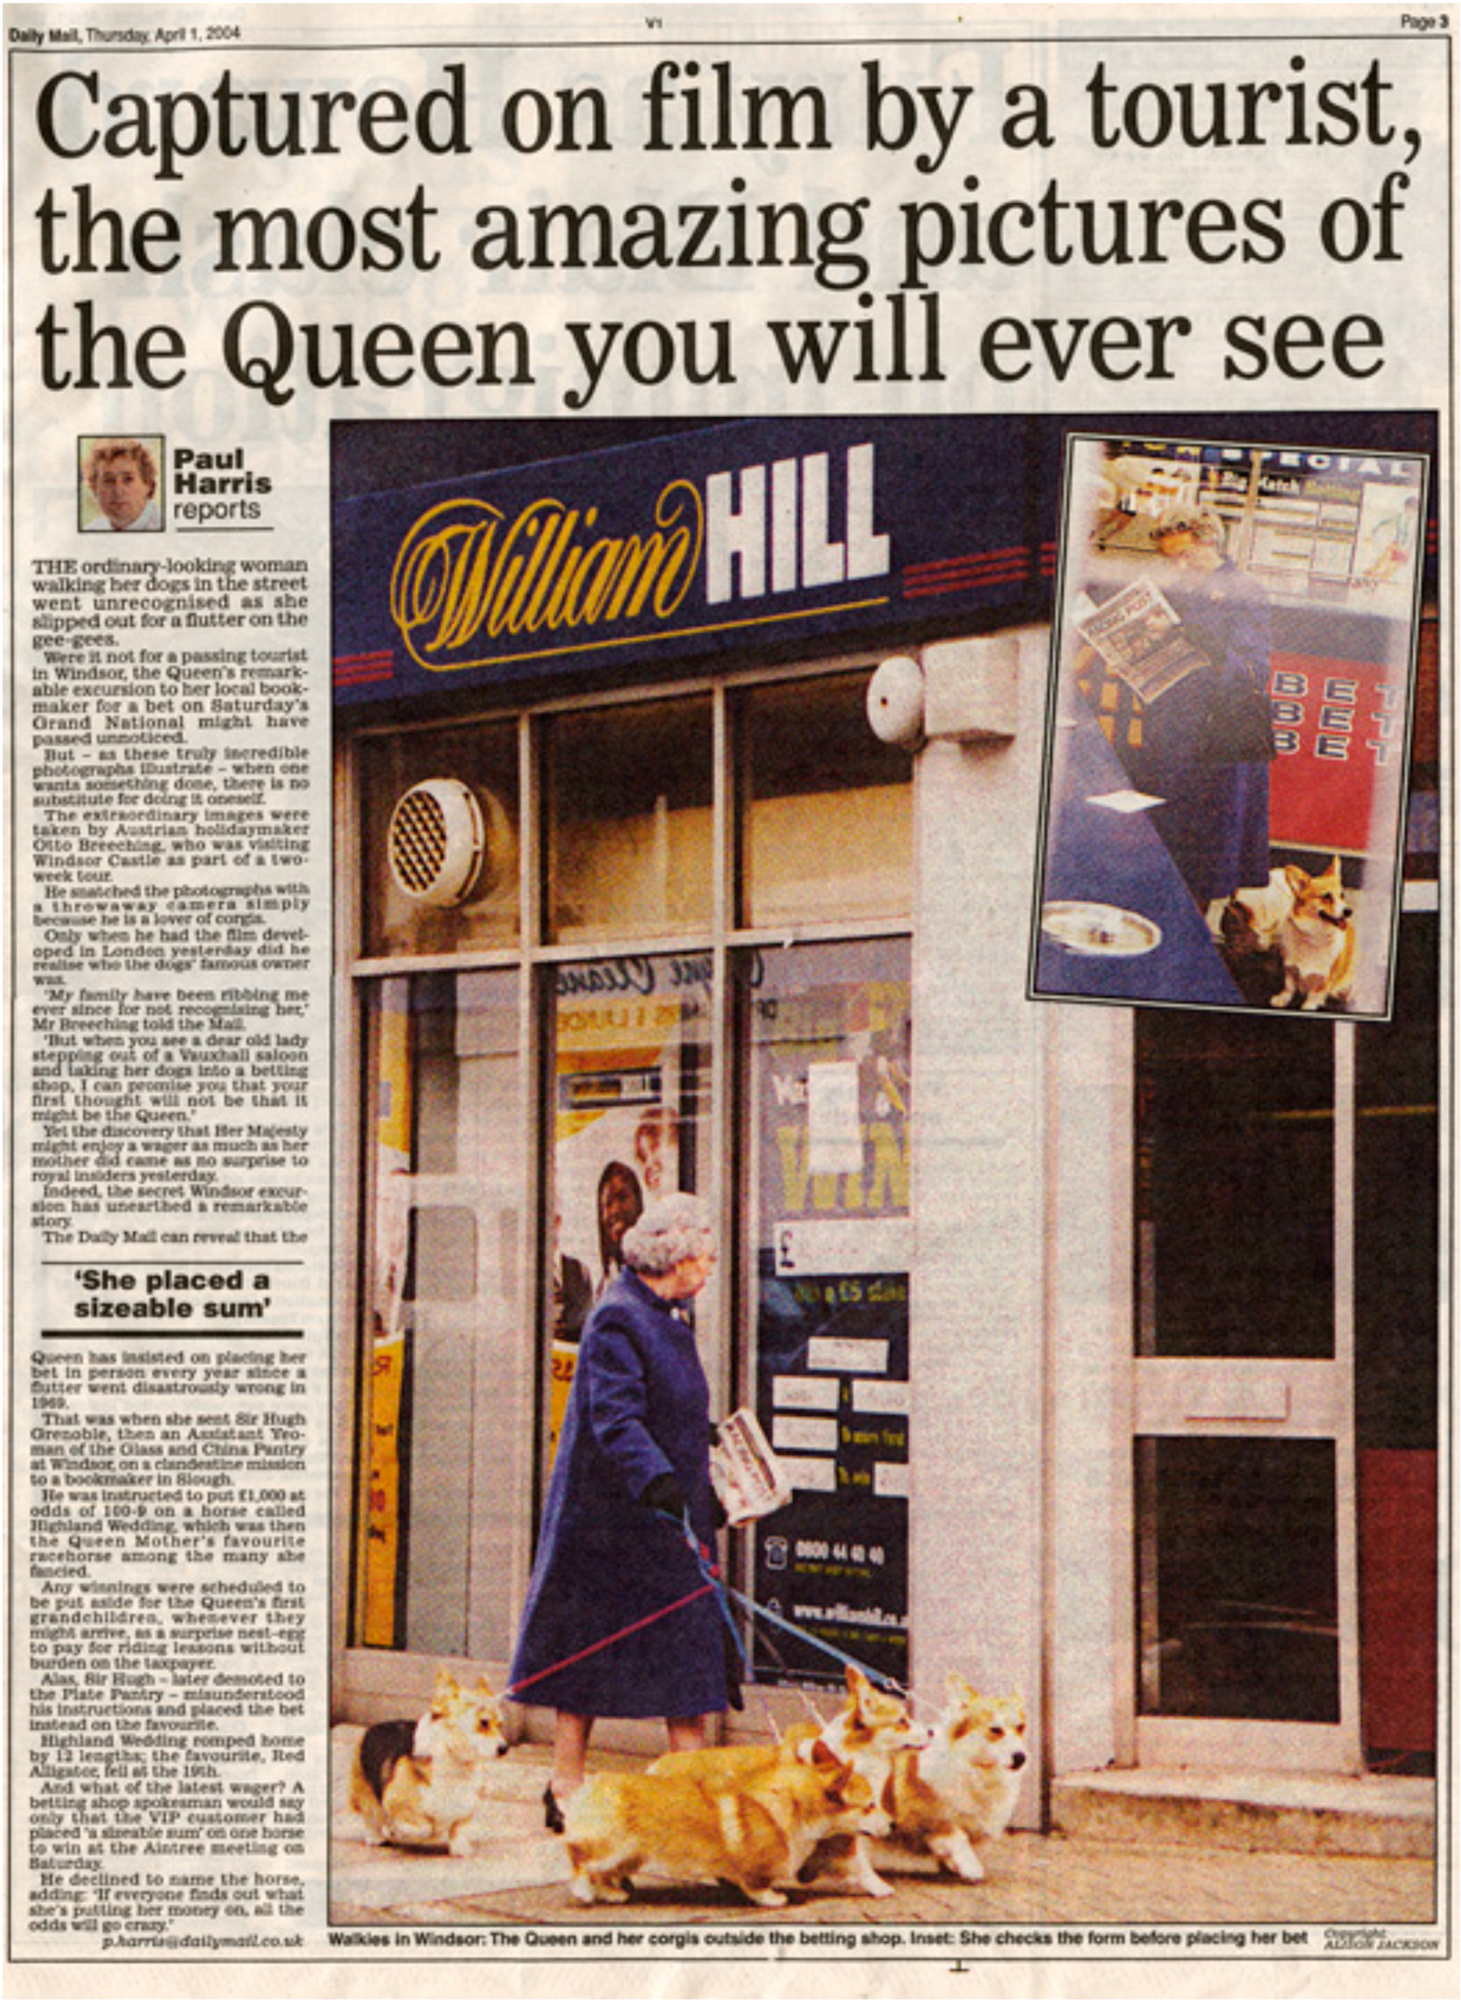 Press-Queen-William-Hill.jpg